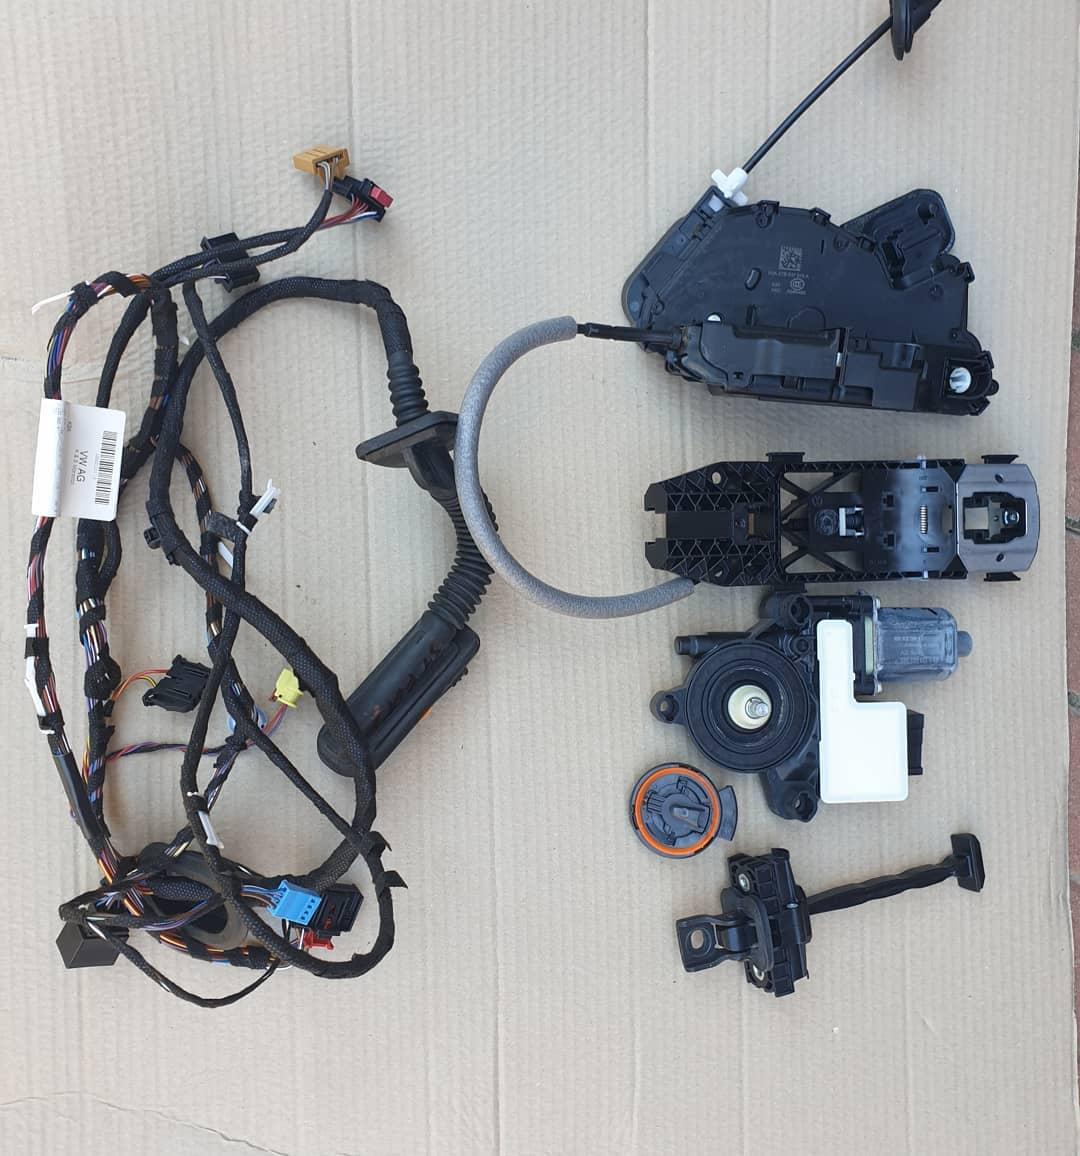 VW Polo Vl Senzor impact, balama, instalatie, broasca, incuietoare, motoras geam, macara geam, plastic usa stanga fata !